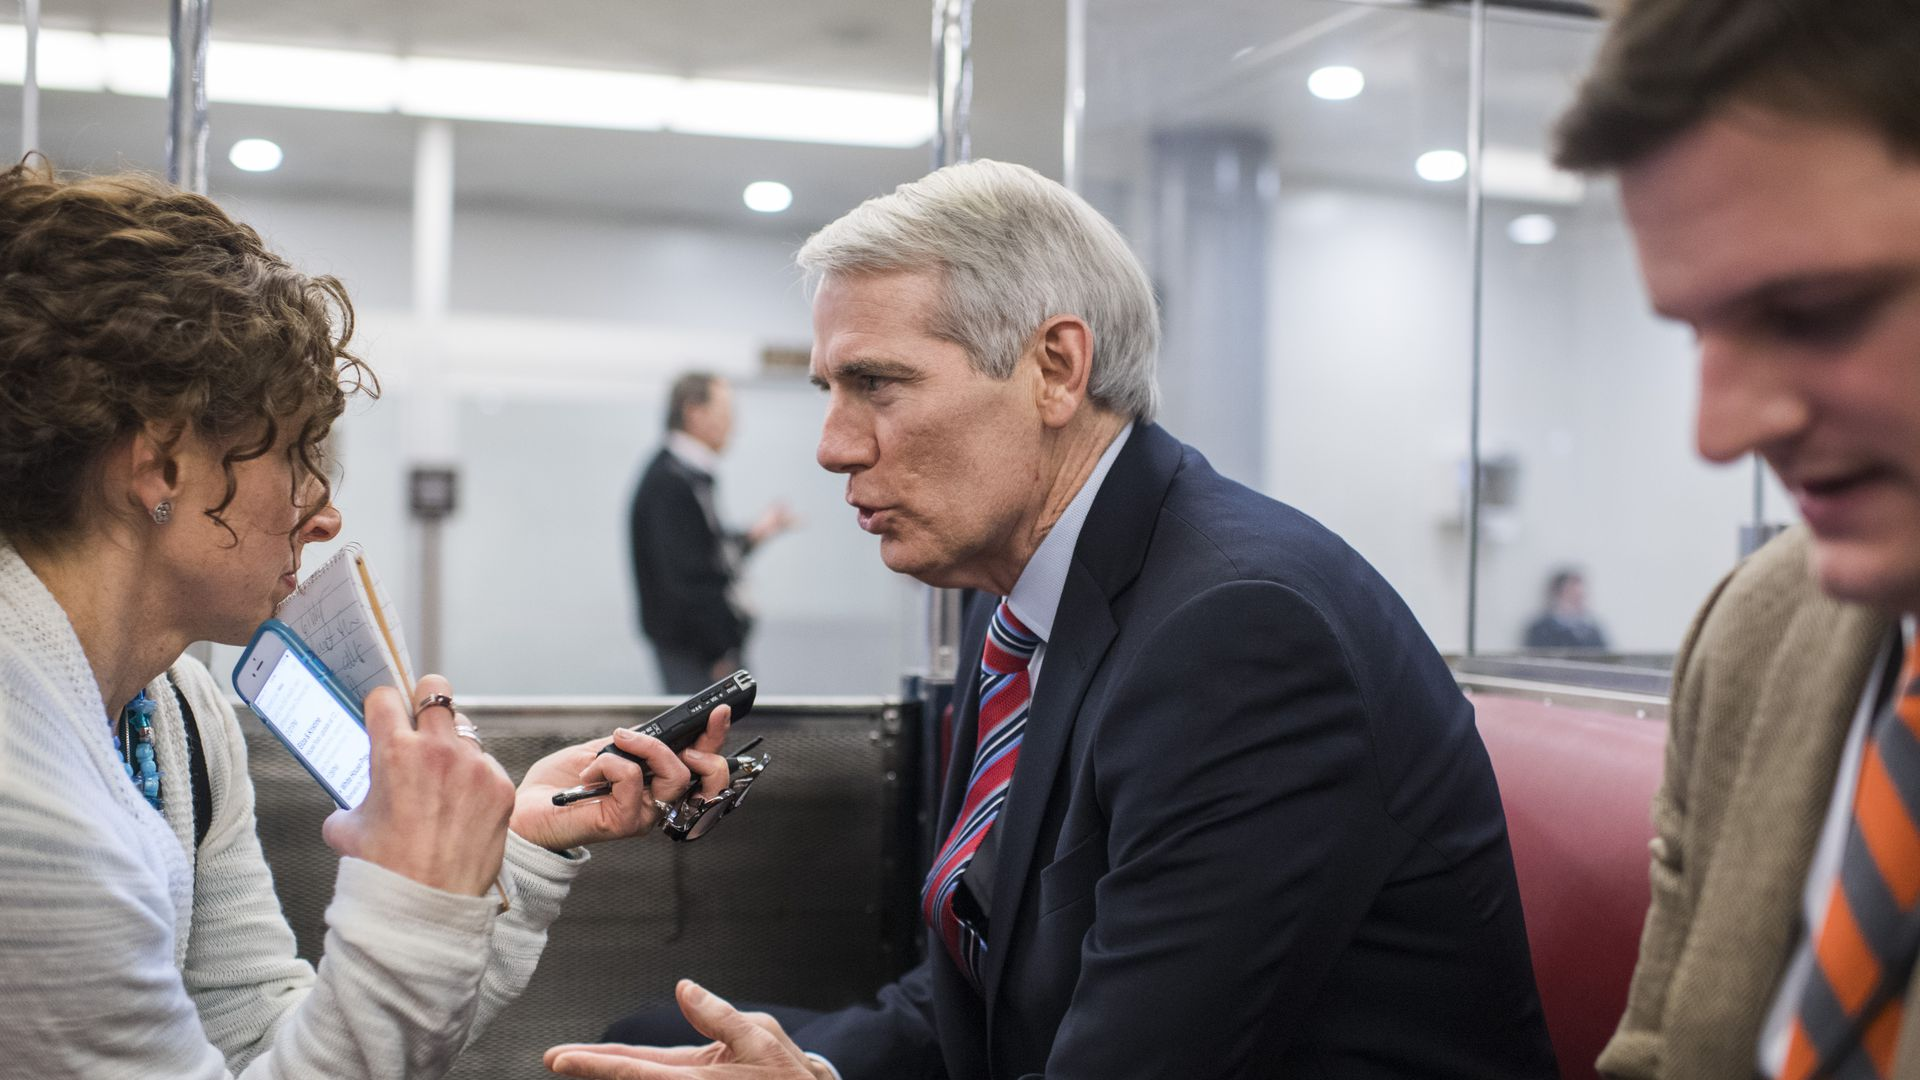 Senator Rob Portman talks to reporters on a train